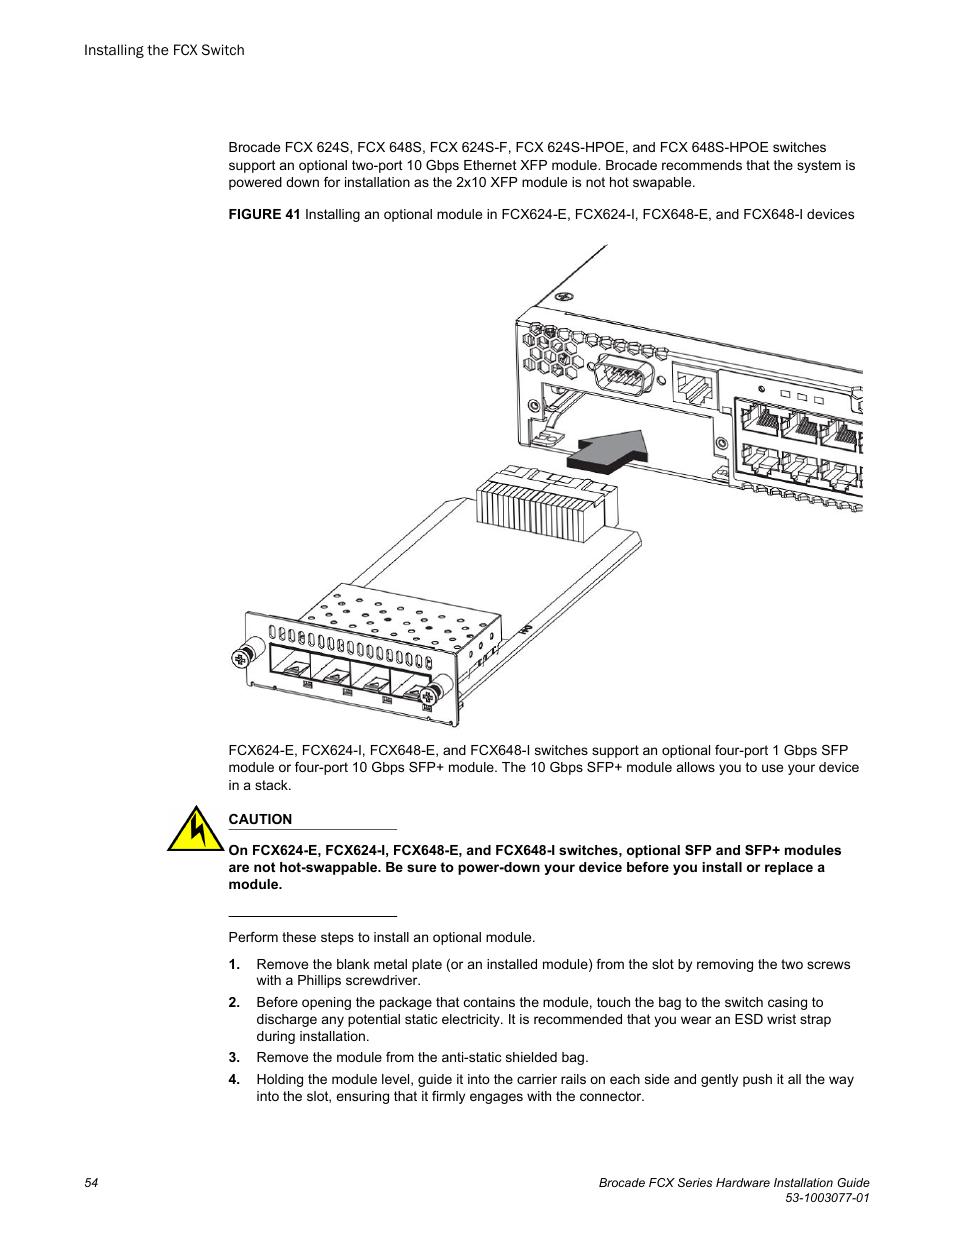 Brocade fcx648s configuration guide